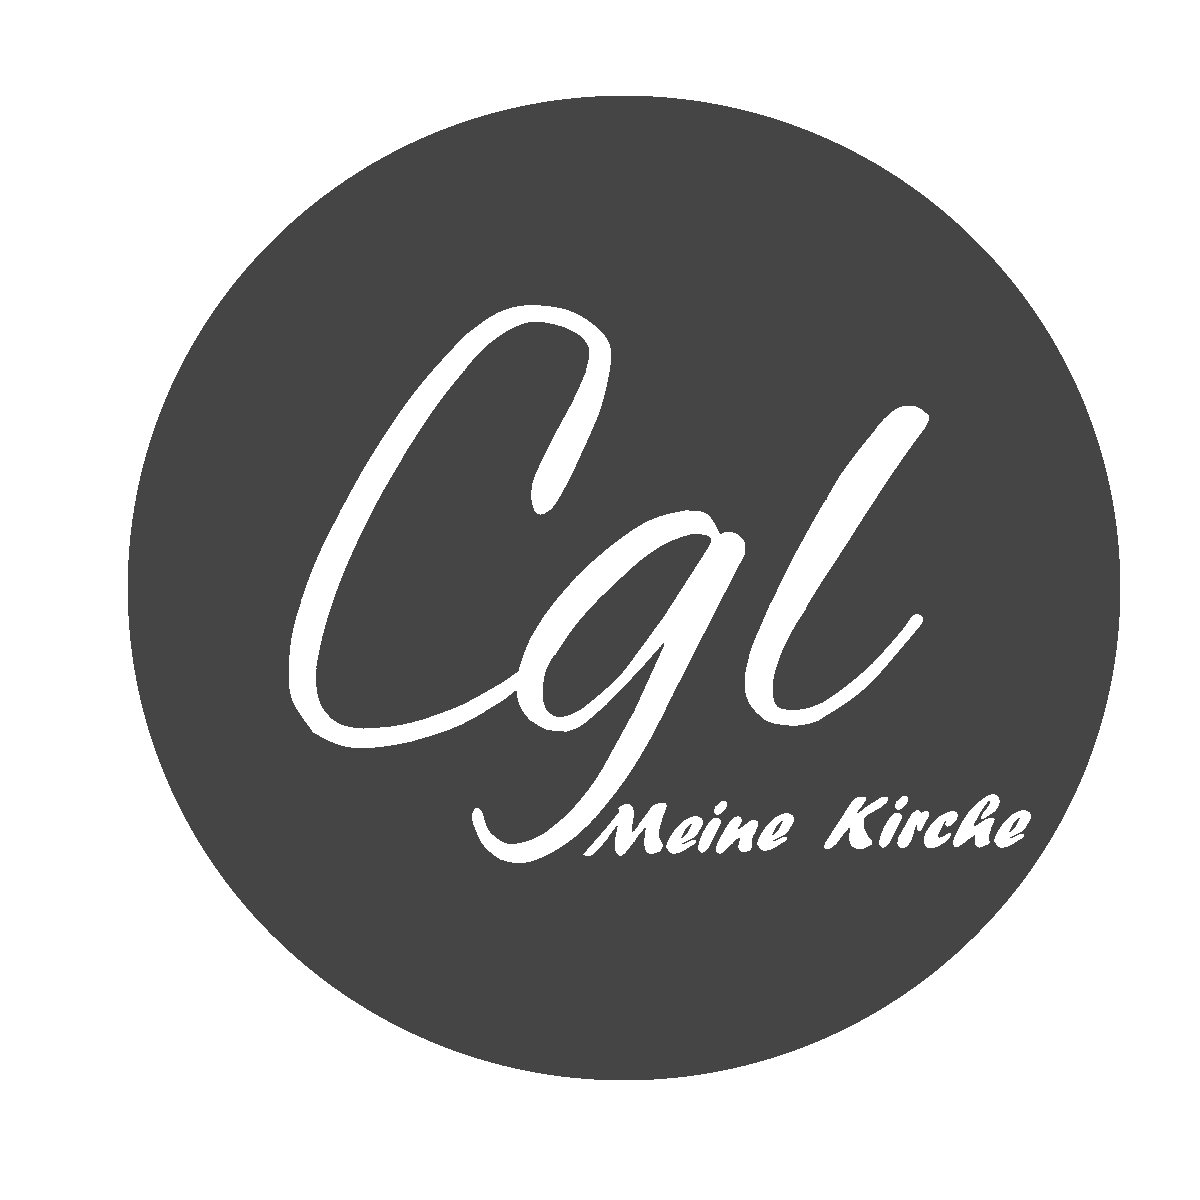 (c) Cgl-gemeinde.de